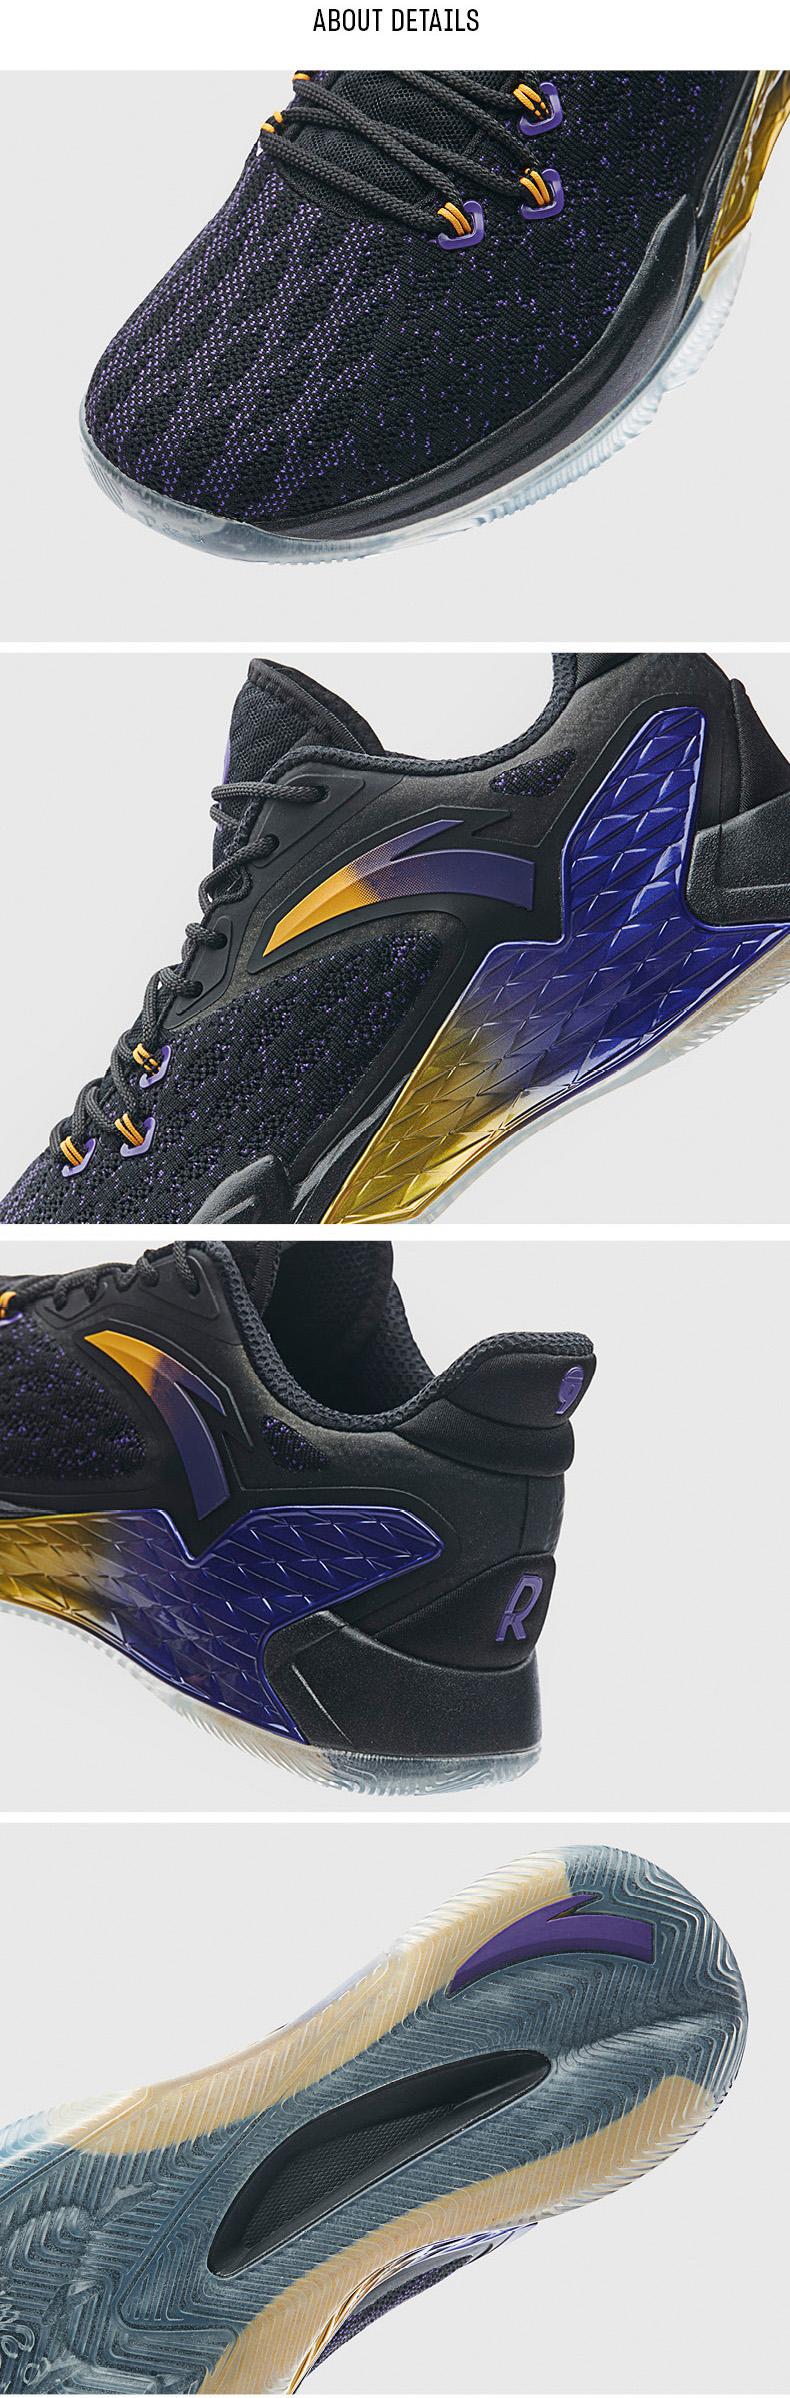 2019 Summer Anta Rajon Rondo RR5 NBA Basketball Shoes - White/Purple/Yellow